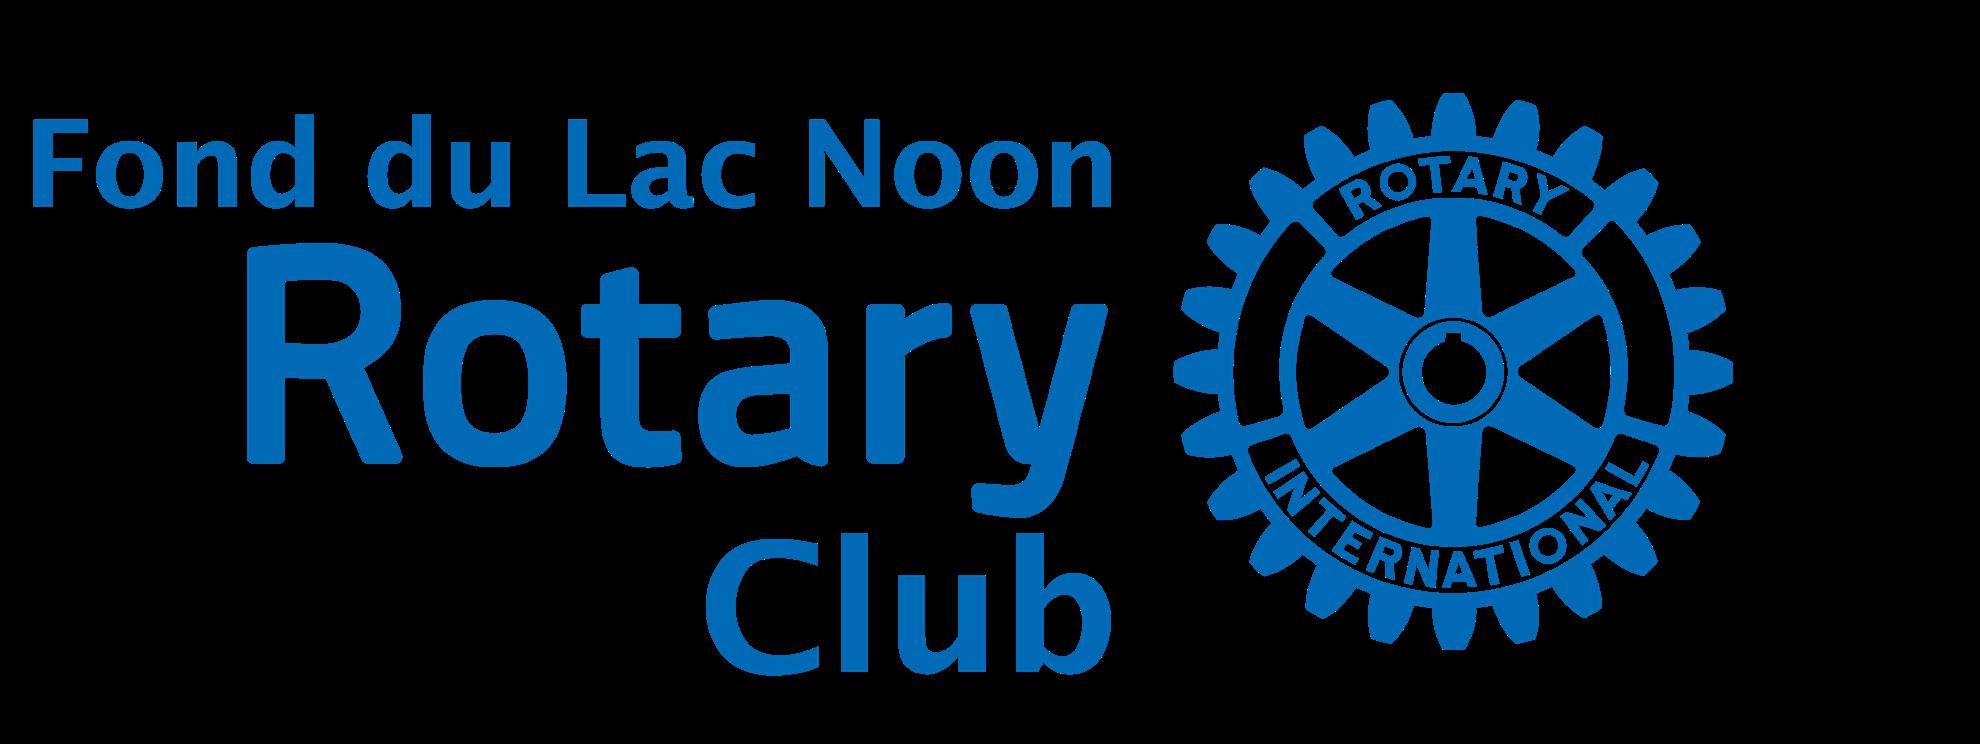 Fond du Lac logo